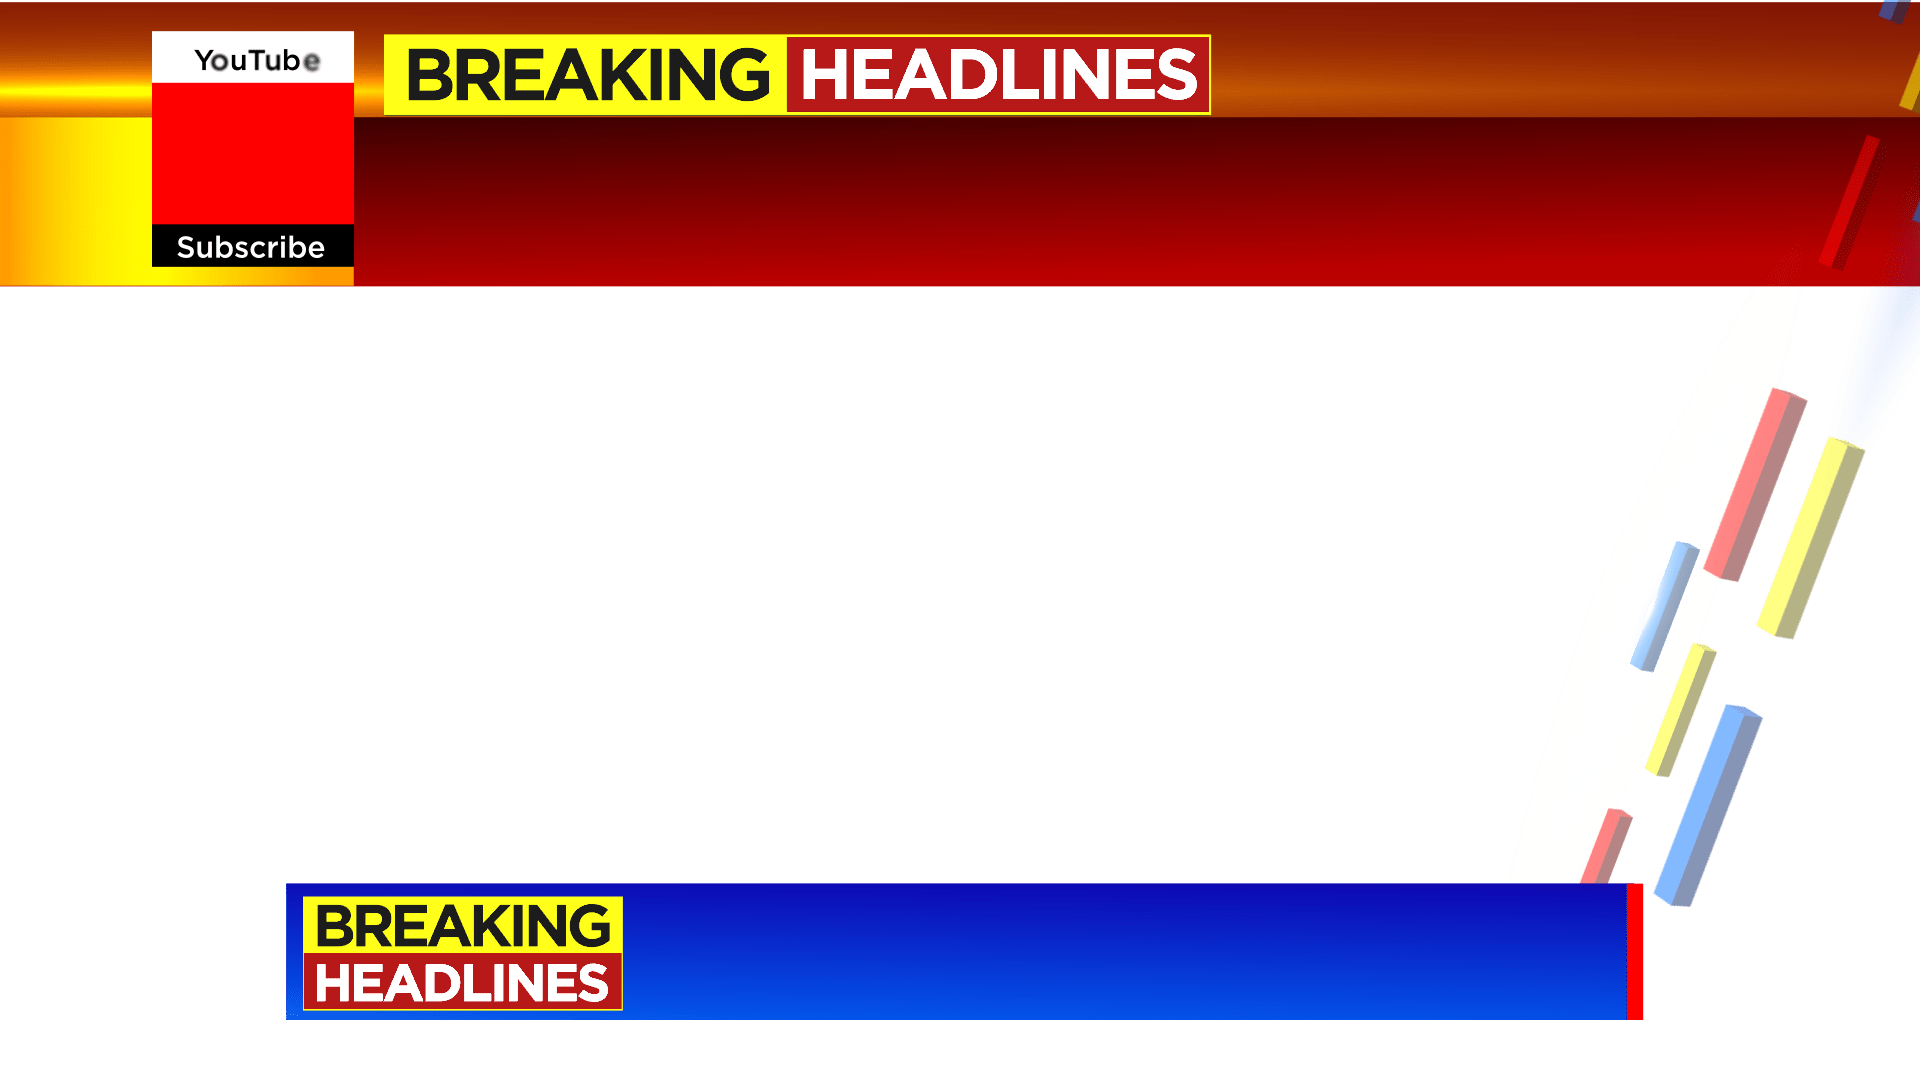 Download Free Breaking News And Breaking Headlines Png Psd Files Headlines Video Editing Apps Breaking News